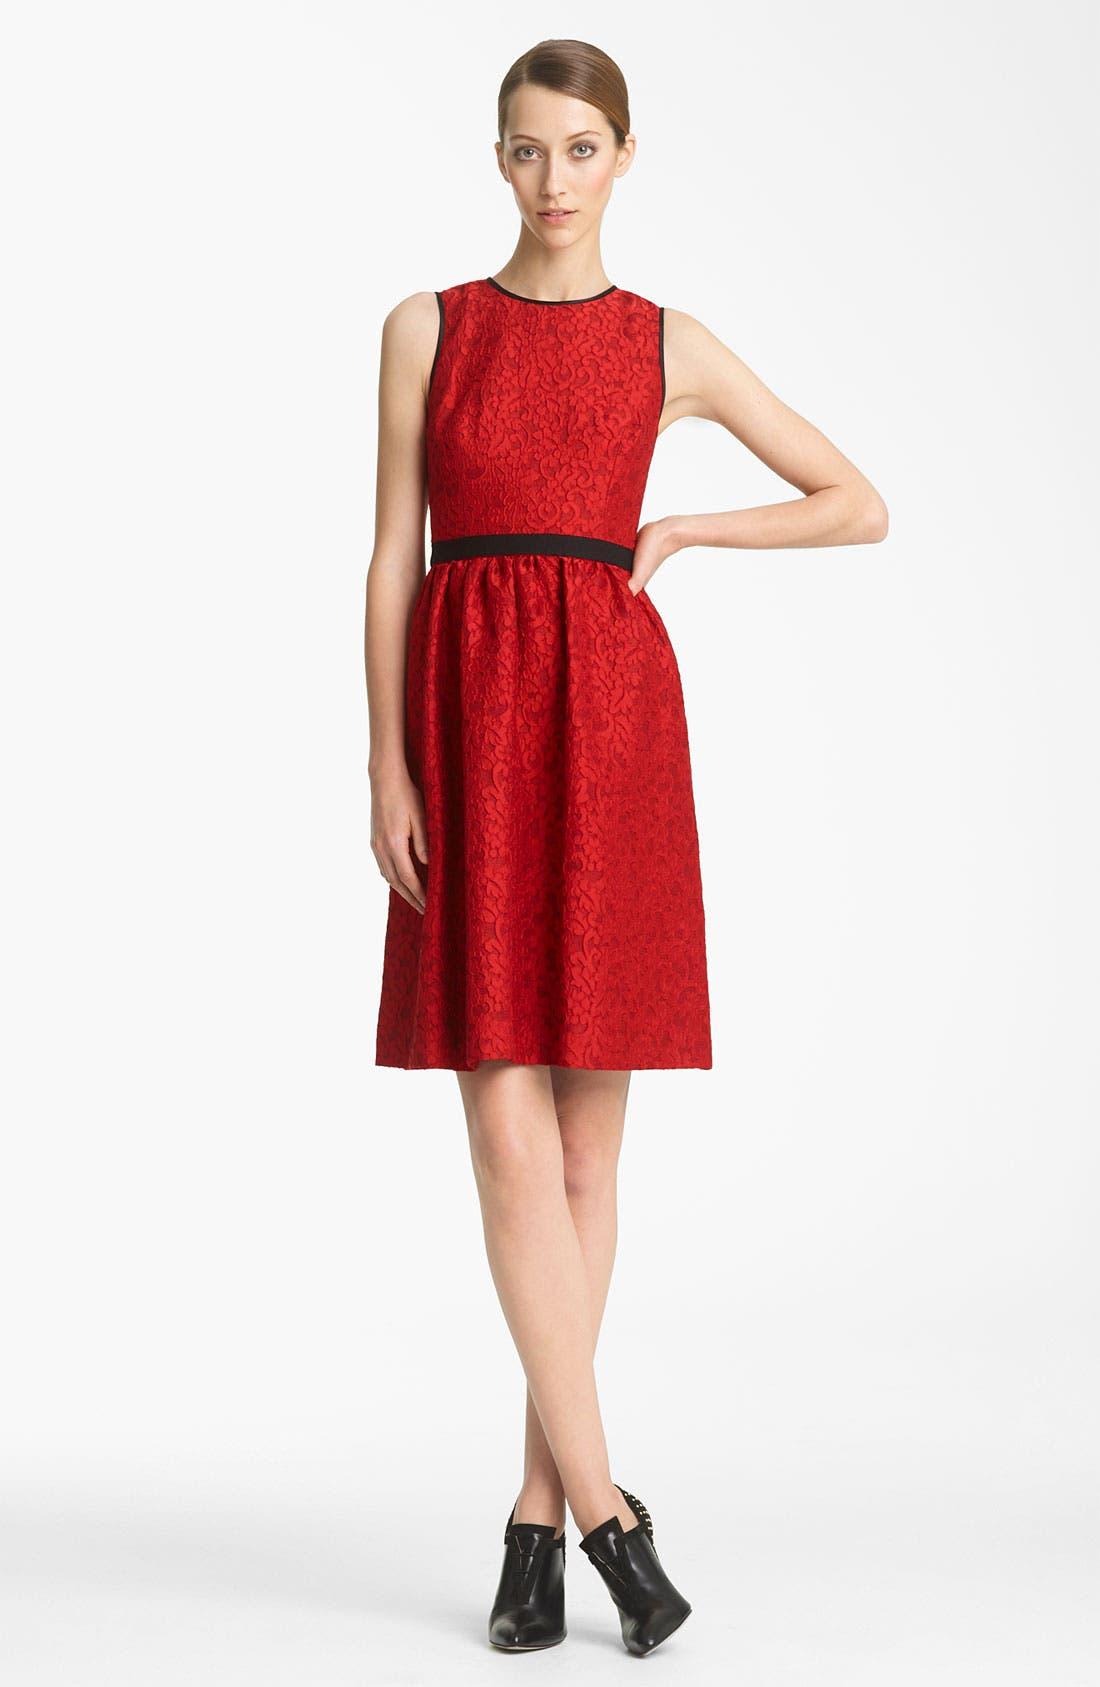 Alternate Image 1 Selected - Jason Wu Lace Jacquard Dress